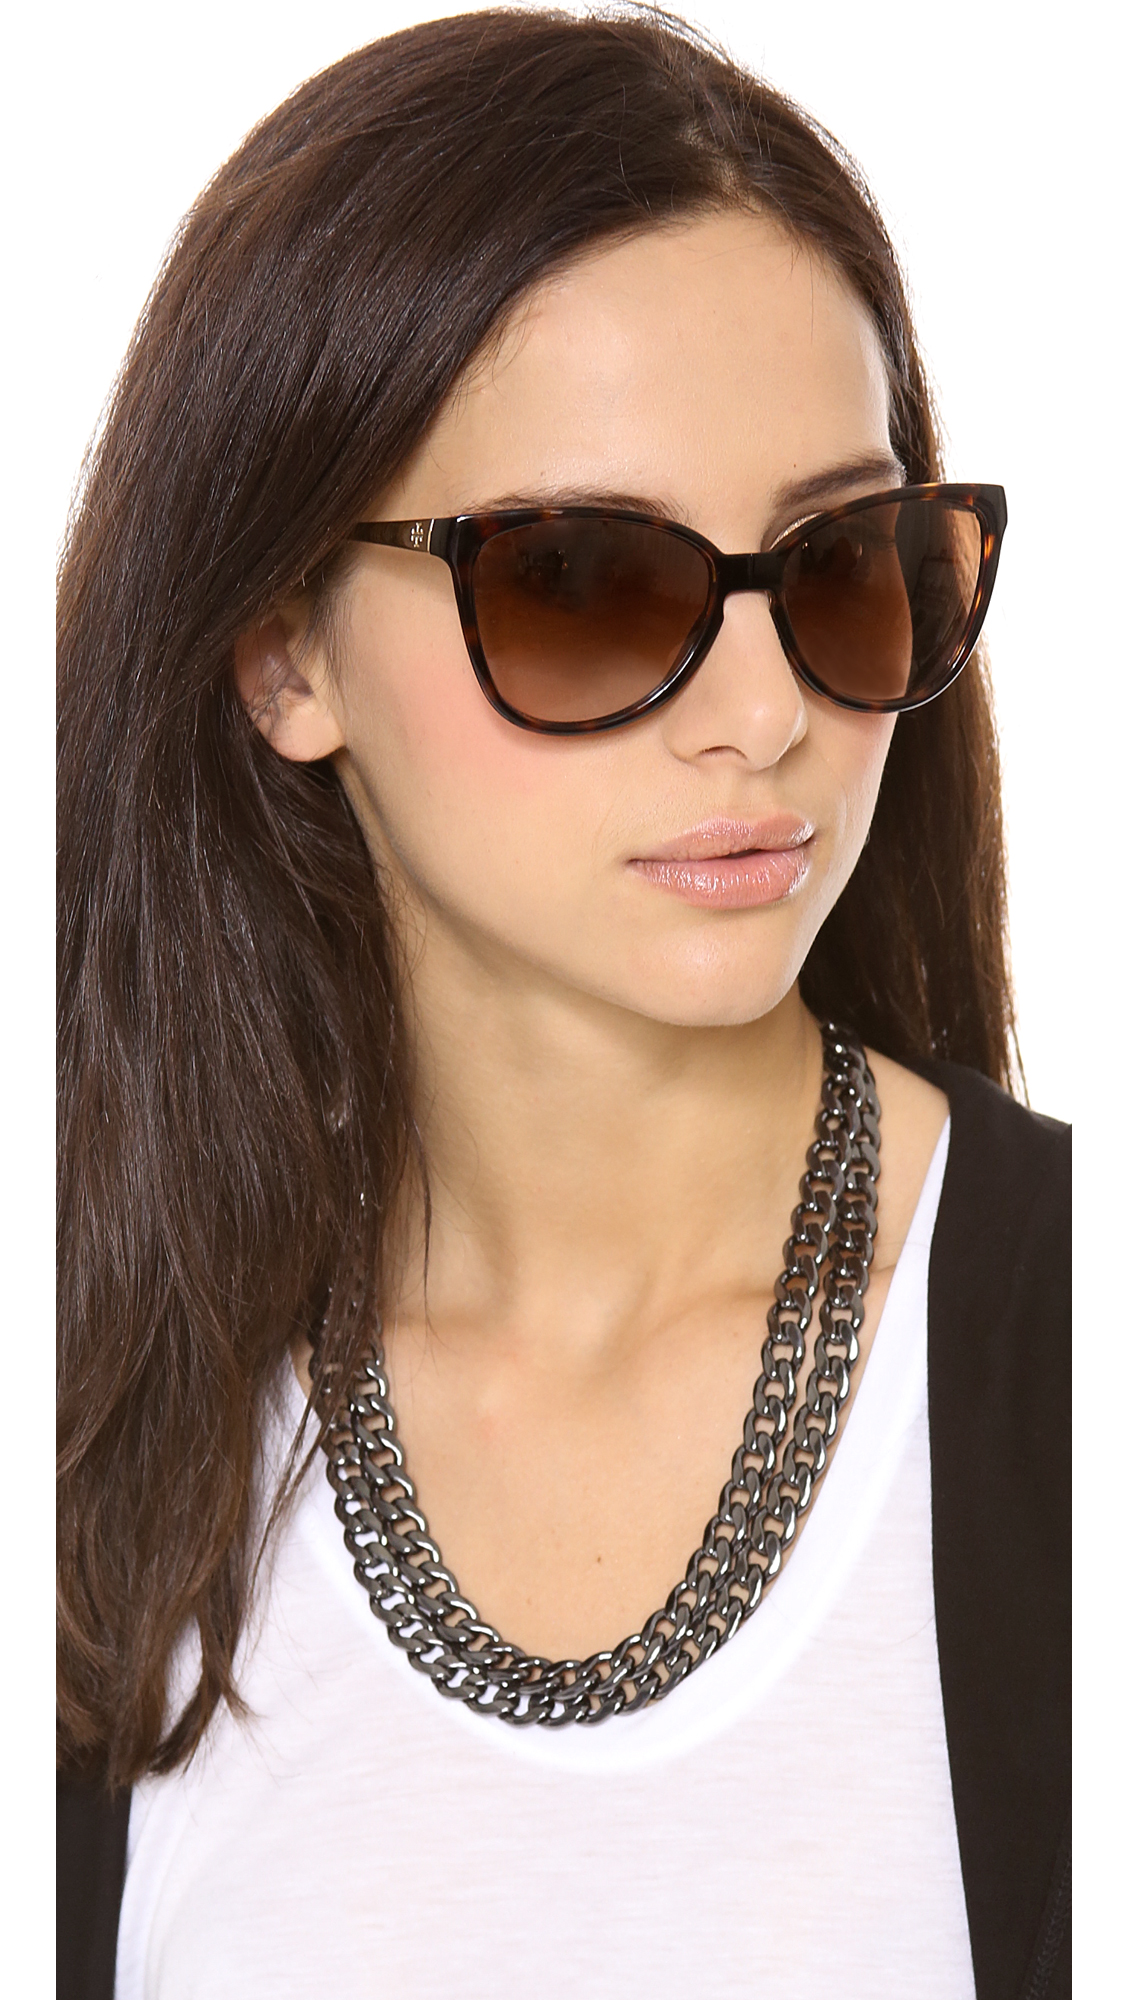 Tory Burch Foldable Sunglasses Tory Burch Modern Foldable